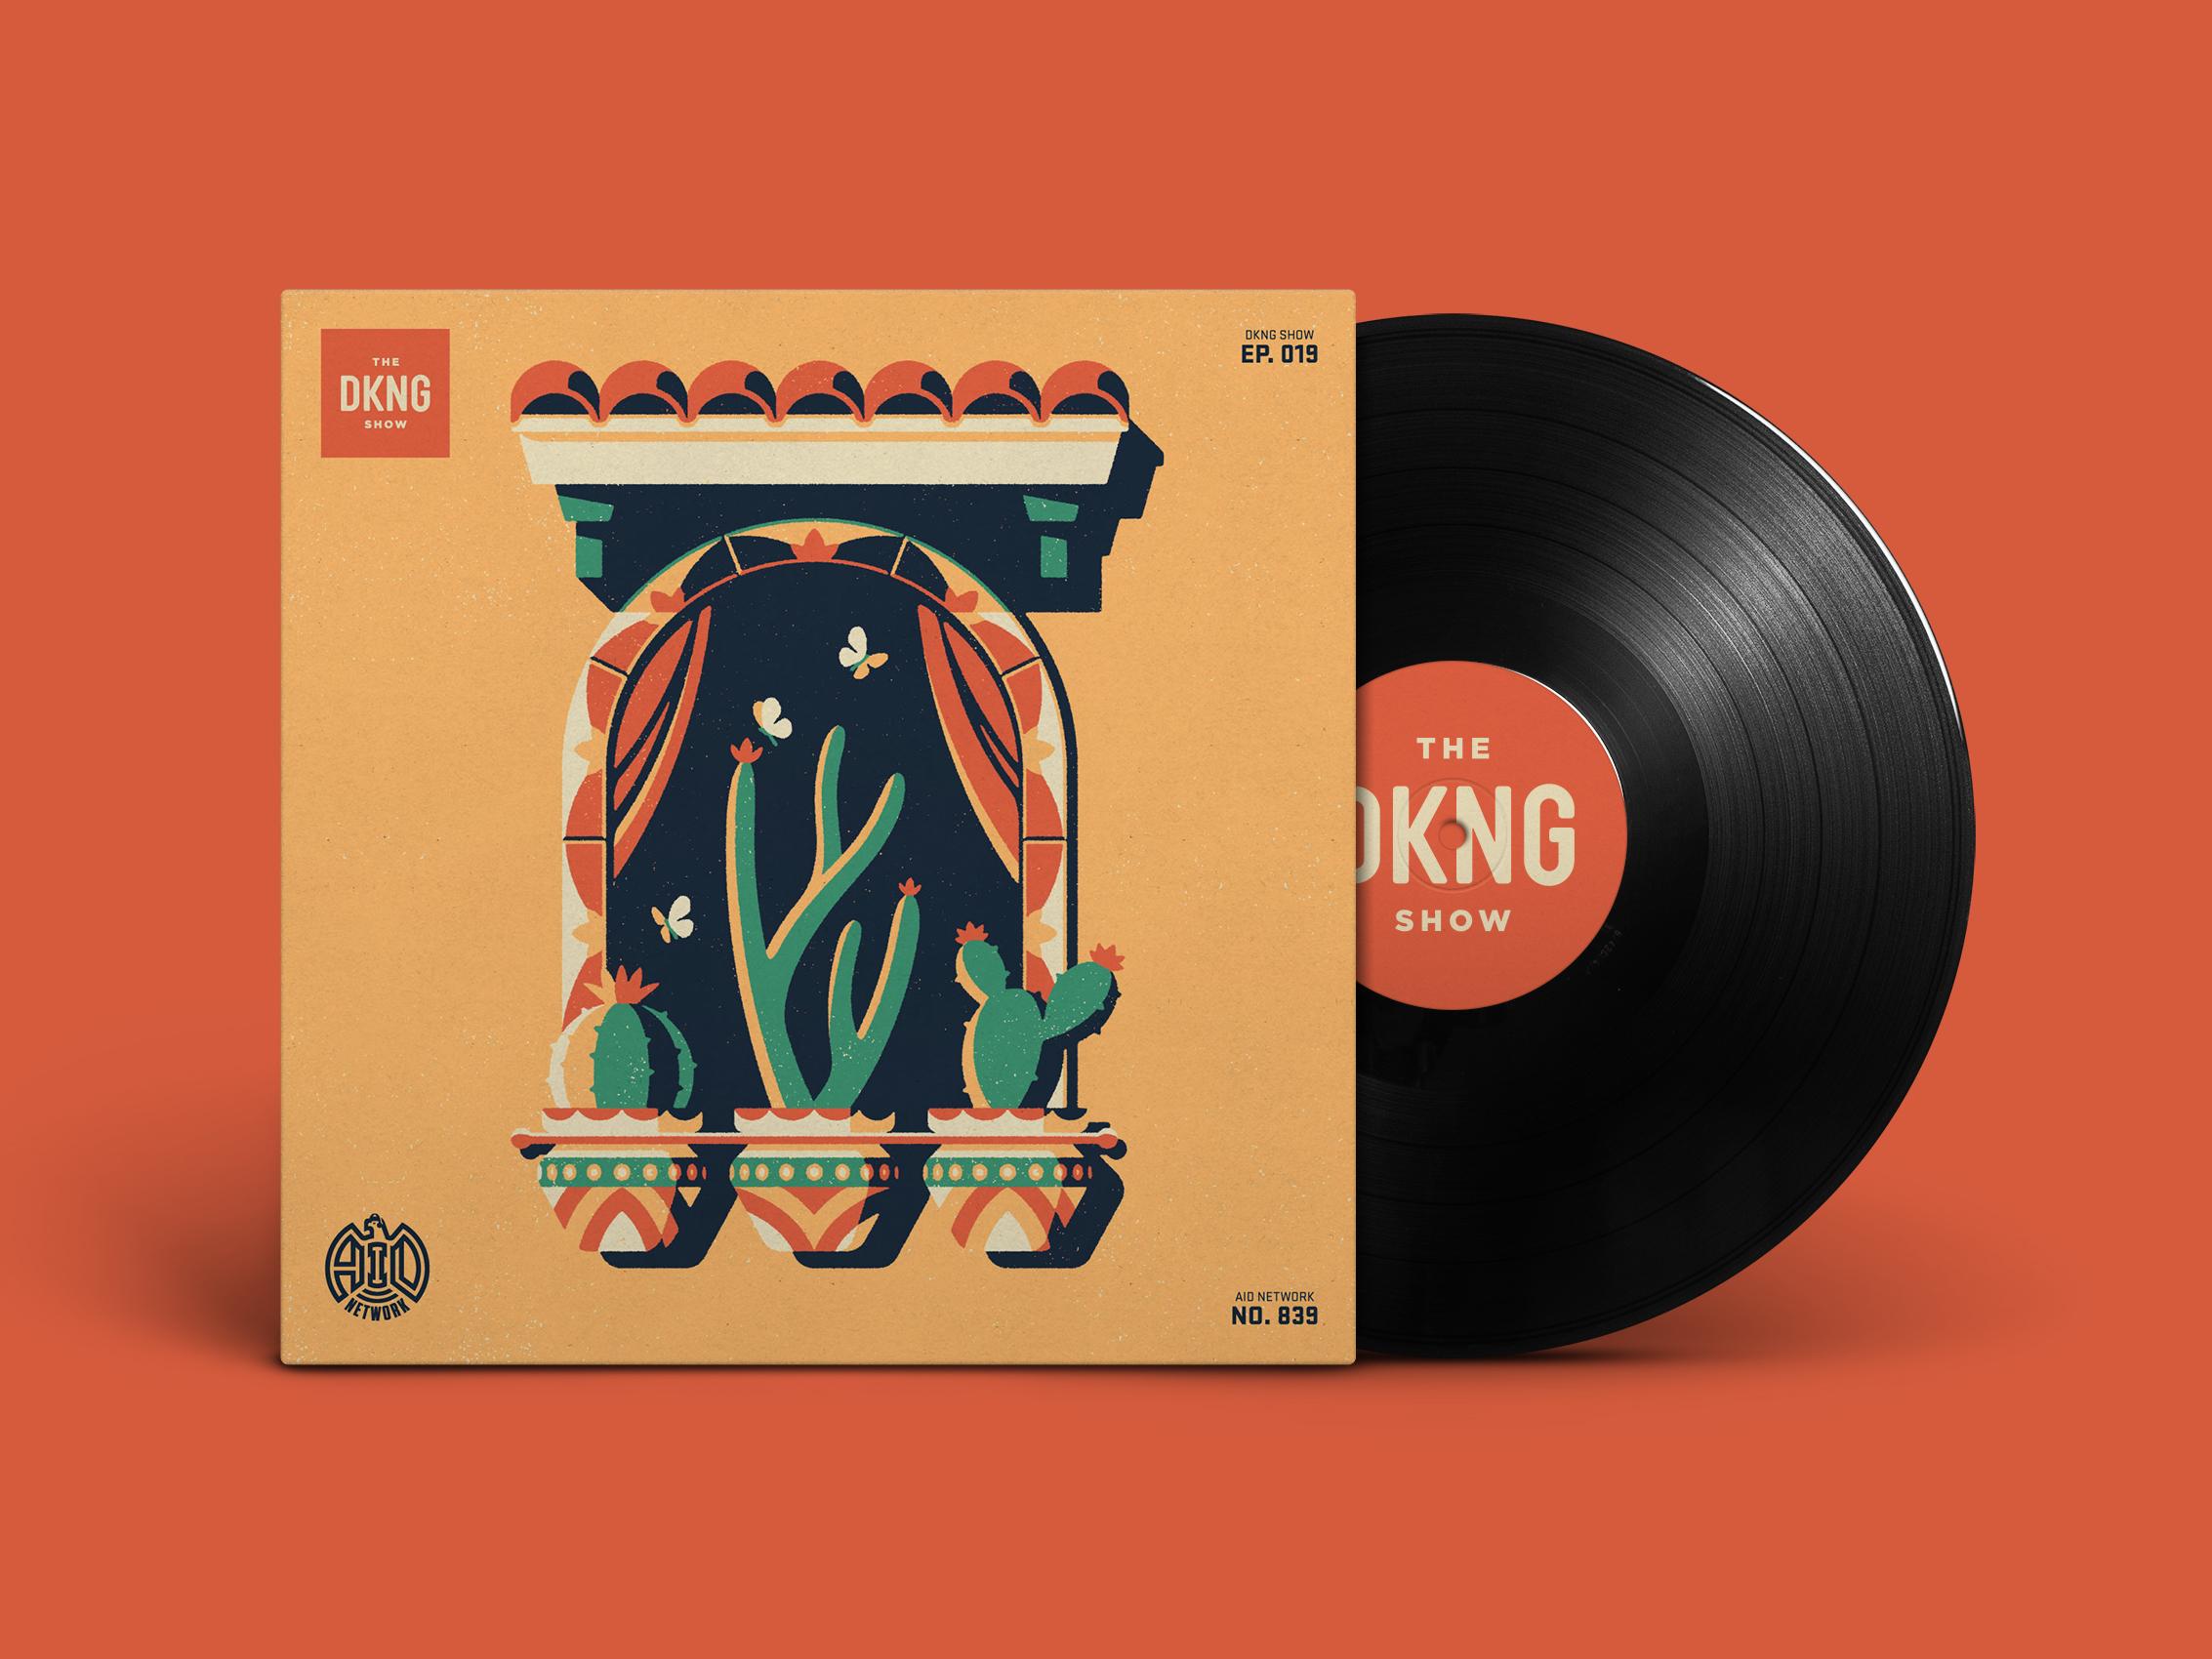 Aid vinyl 19